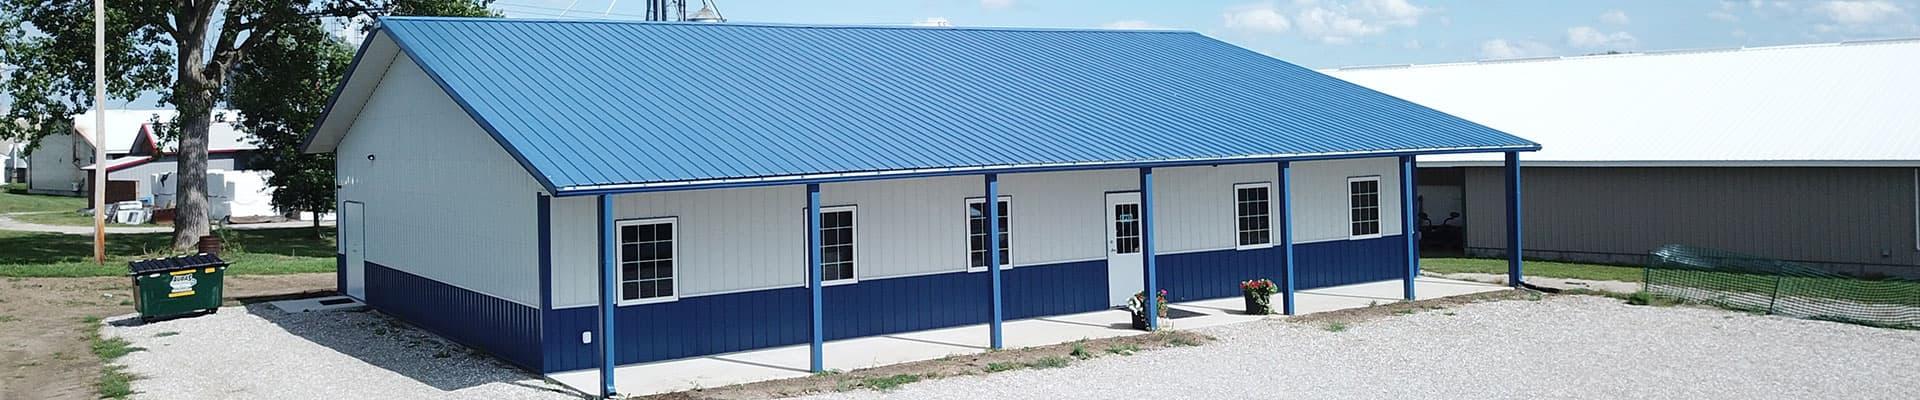 Proline Building Company